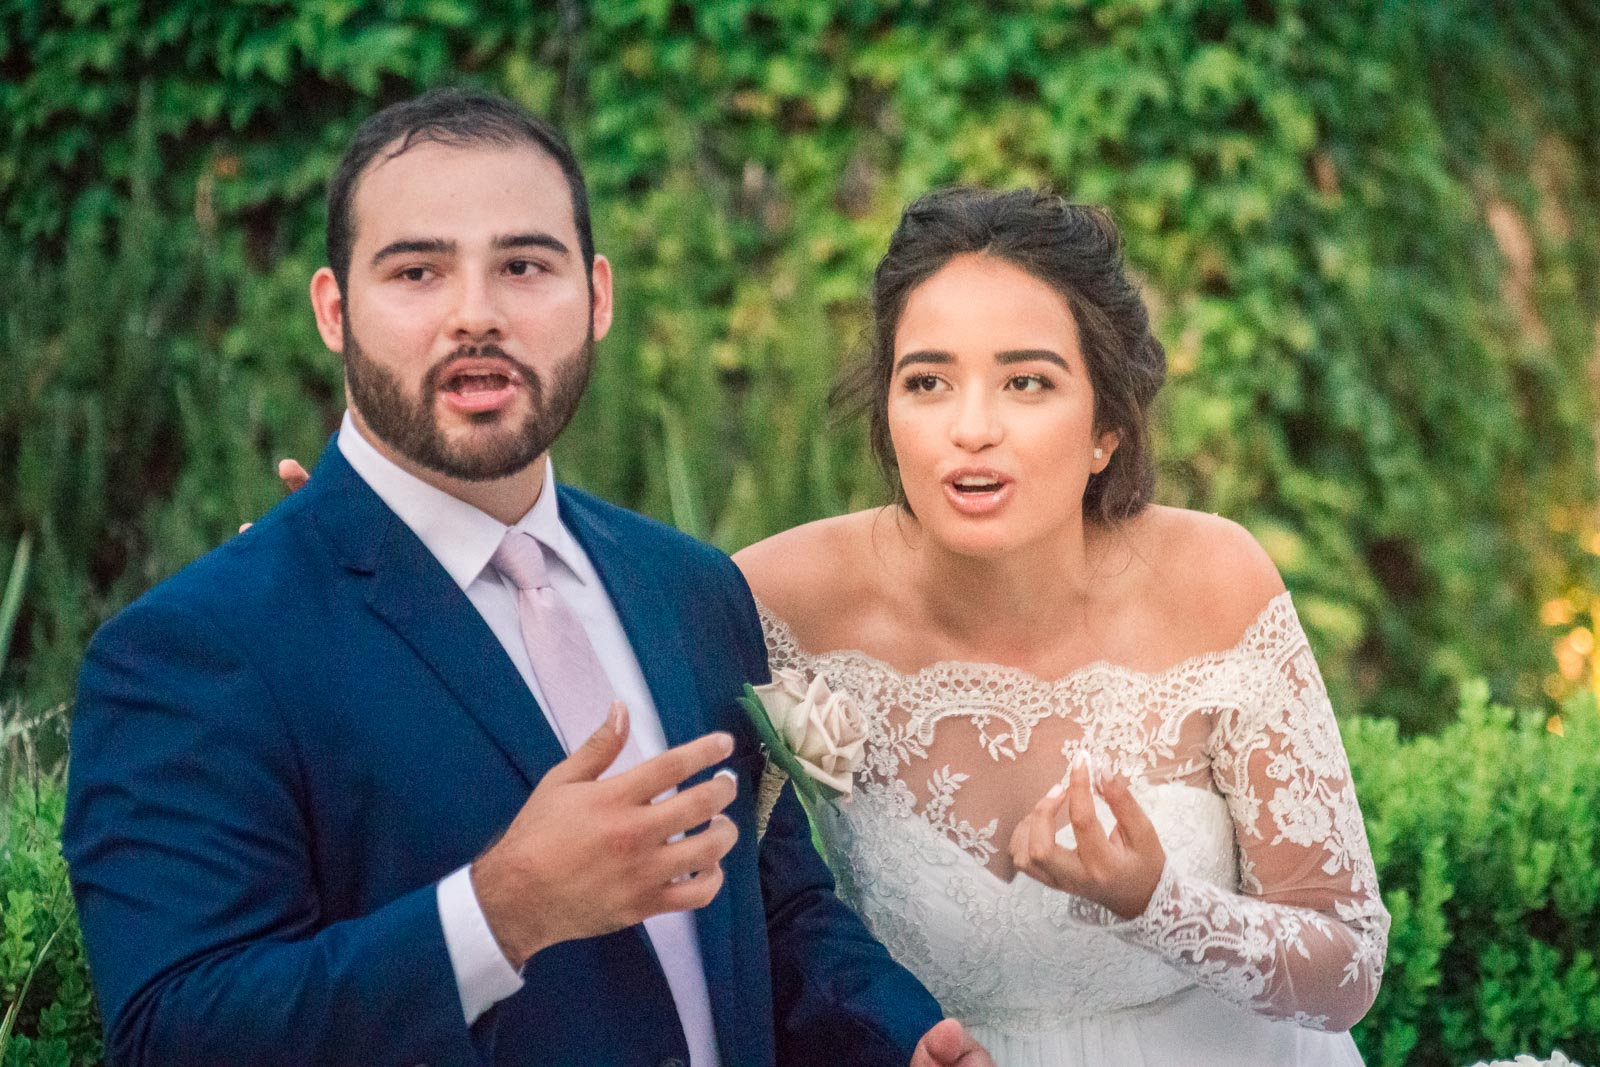 375_Angel-Brea-Orange-County_Joseph-Barber-Wedding-Photography.jpg